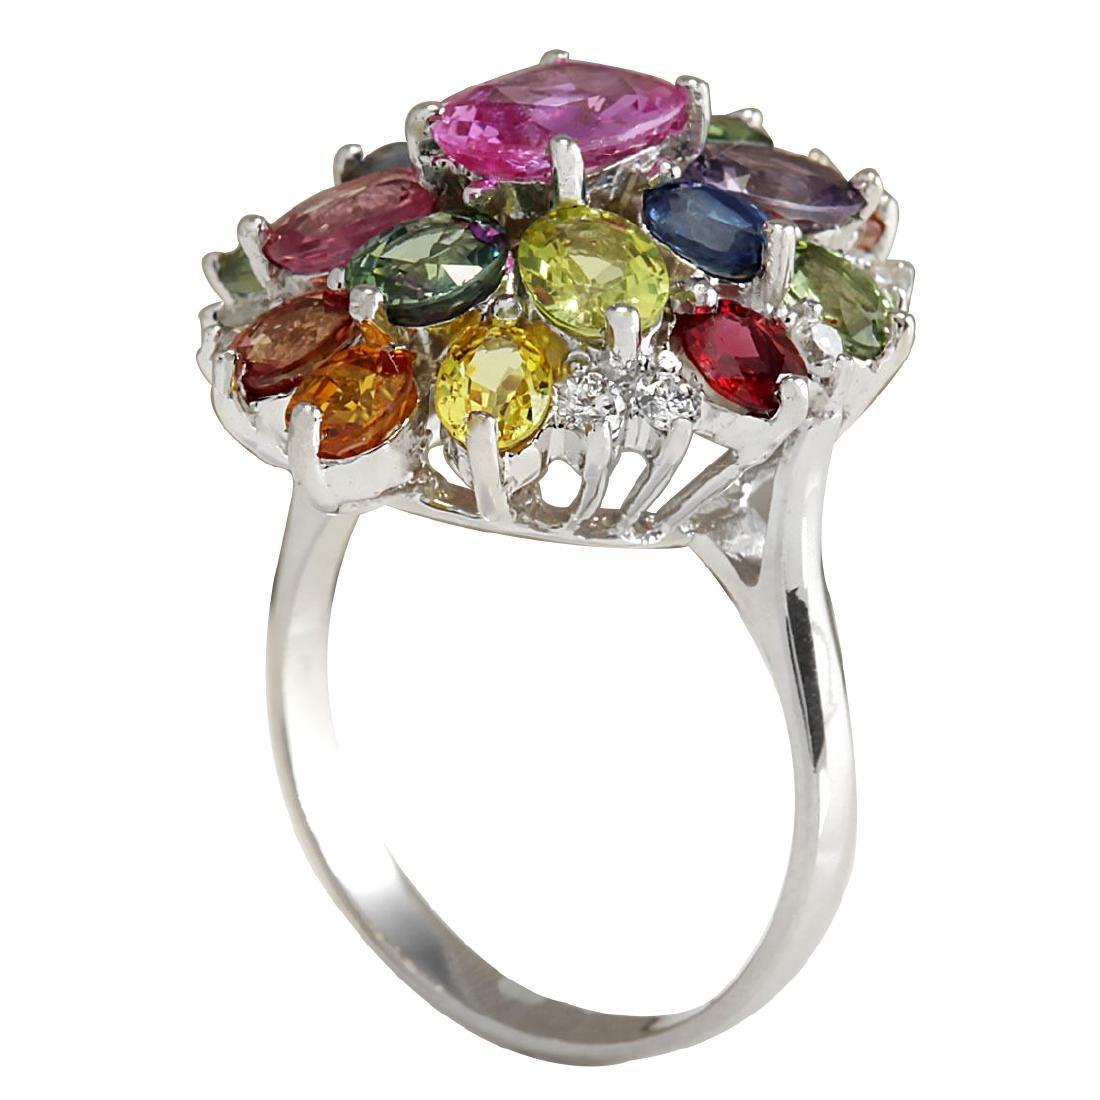 7.63Ct Natural Ceylon Sapphire And Diamond Ring In18K - 3